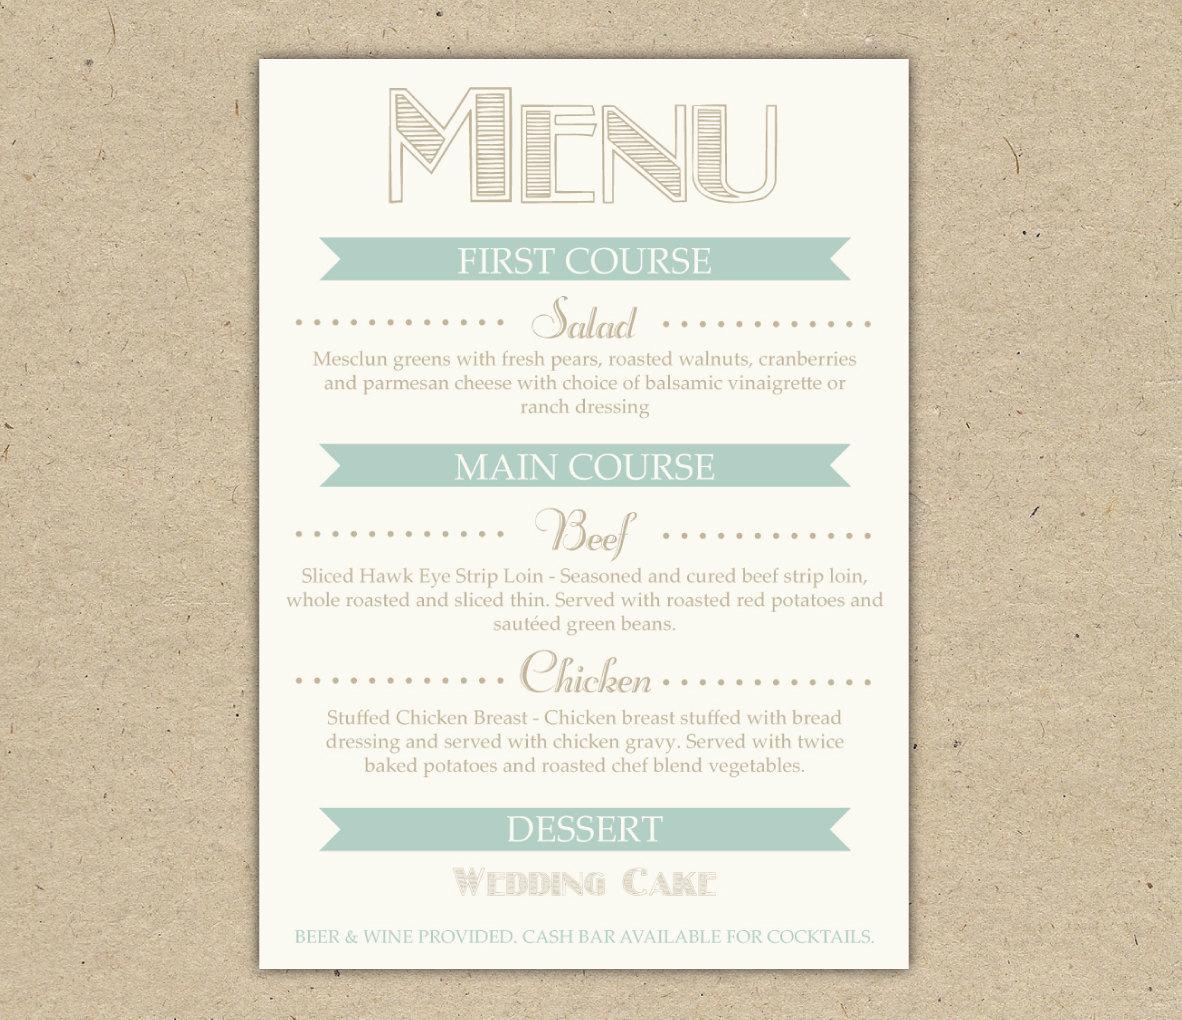 wedding menu dinner custom printable template by westandpine. Black Bedroom Furniture Sets. Home Design Ideas